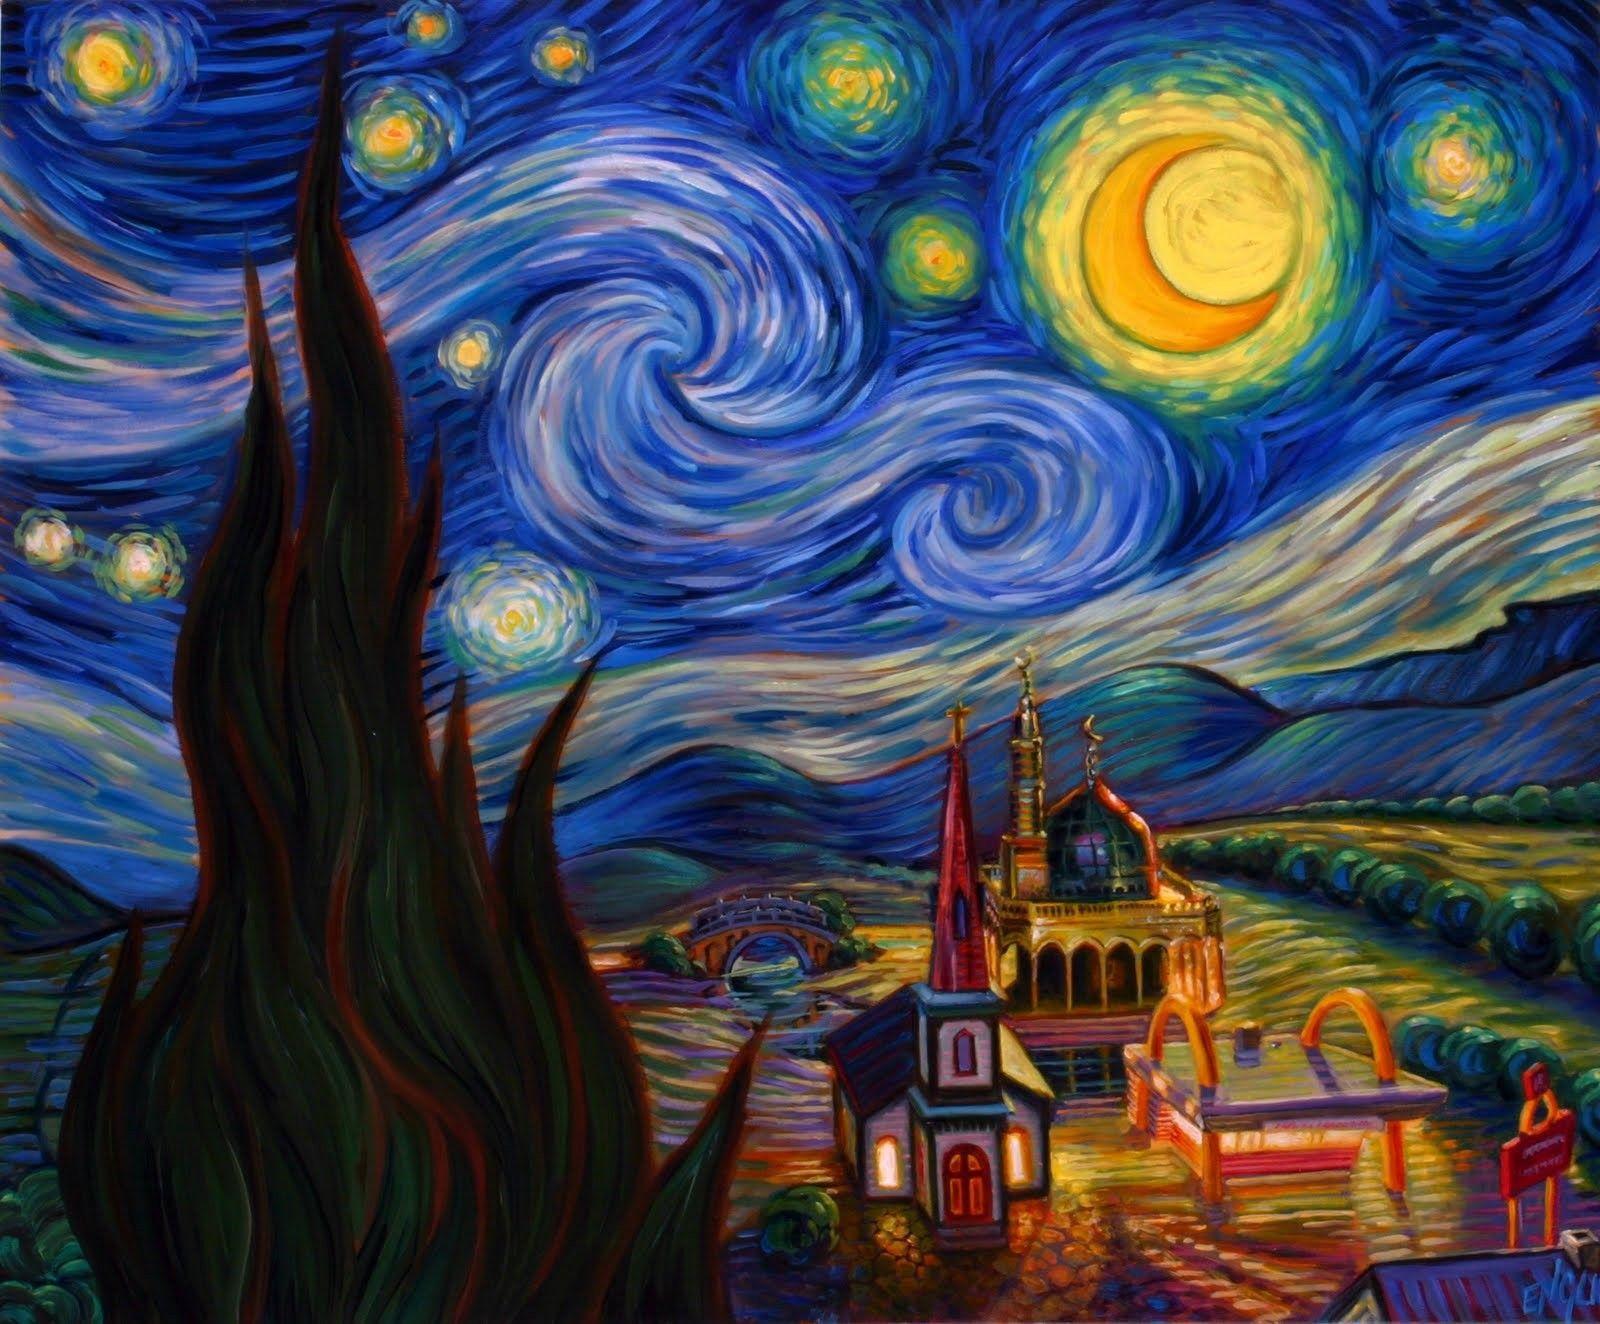 "1920x1200 All Van Gogh Paintings | Vincent-Van-Gogh-Painting-Wallpaper-HD ..."">"